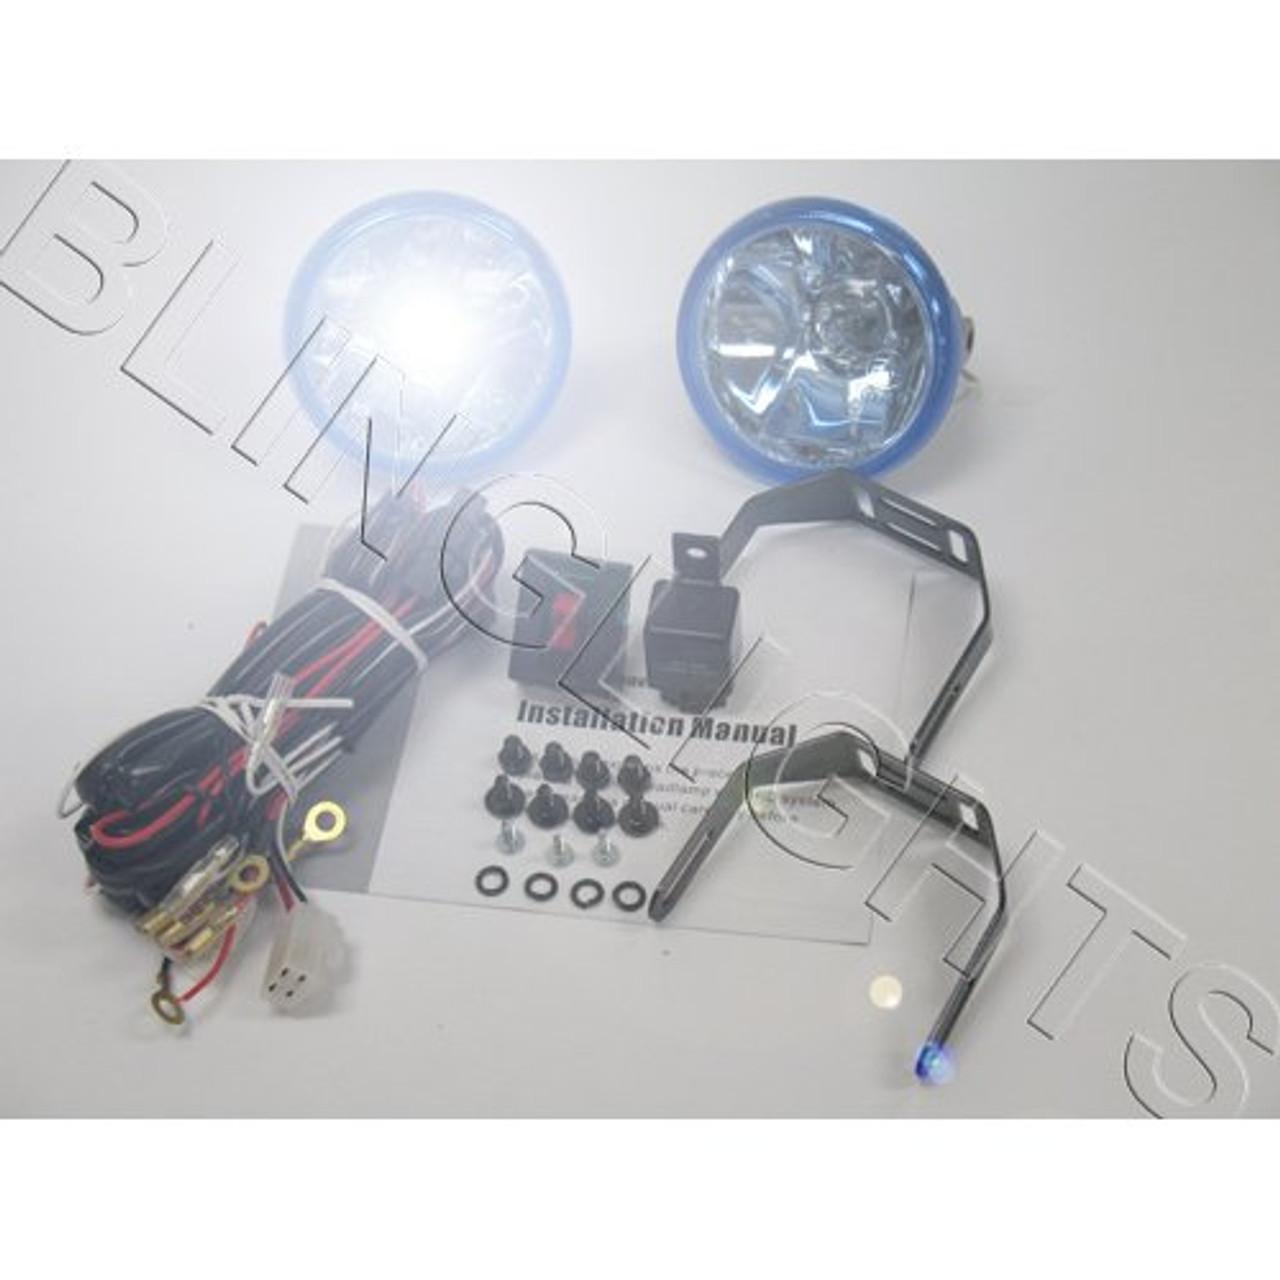 1999 2000 Honda Civic Coupe Si Xenon Foglamps Foglights Fog Lamps Driving Harms Civic Si Wiring Diagram on